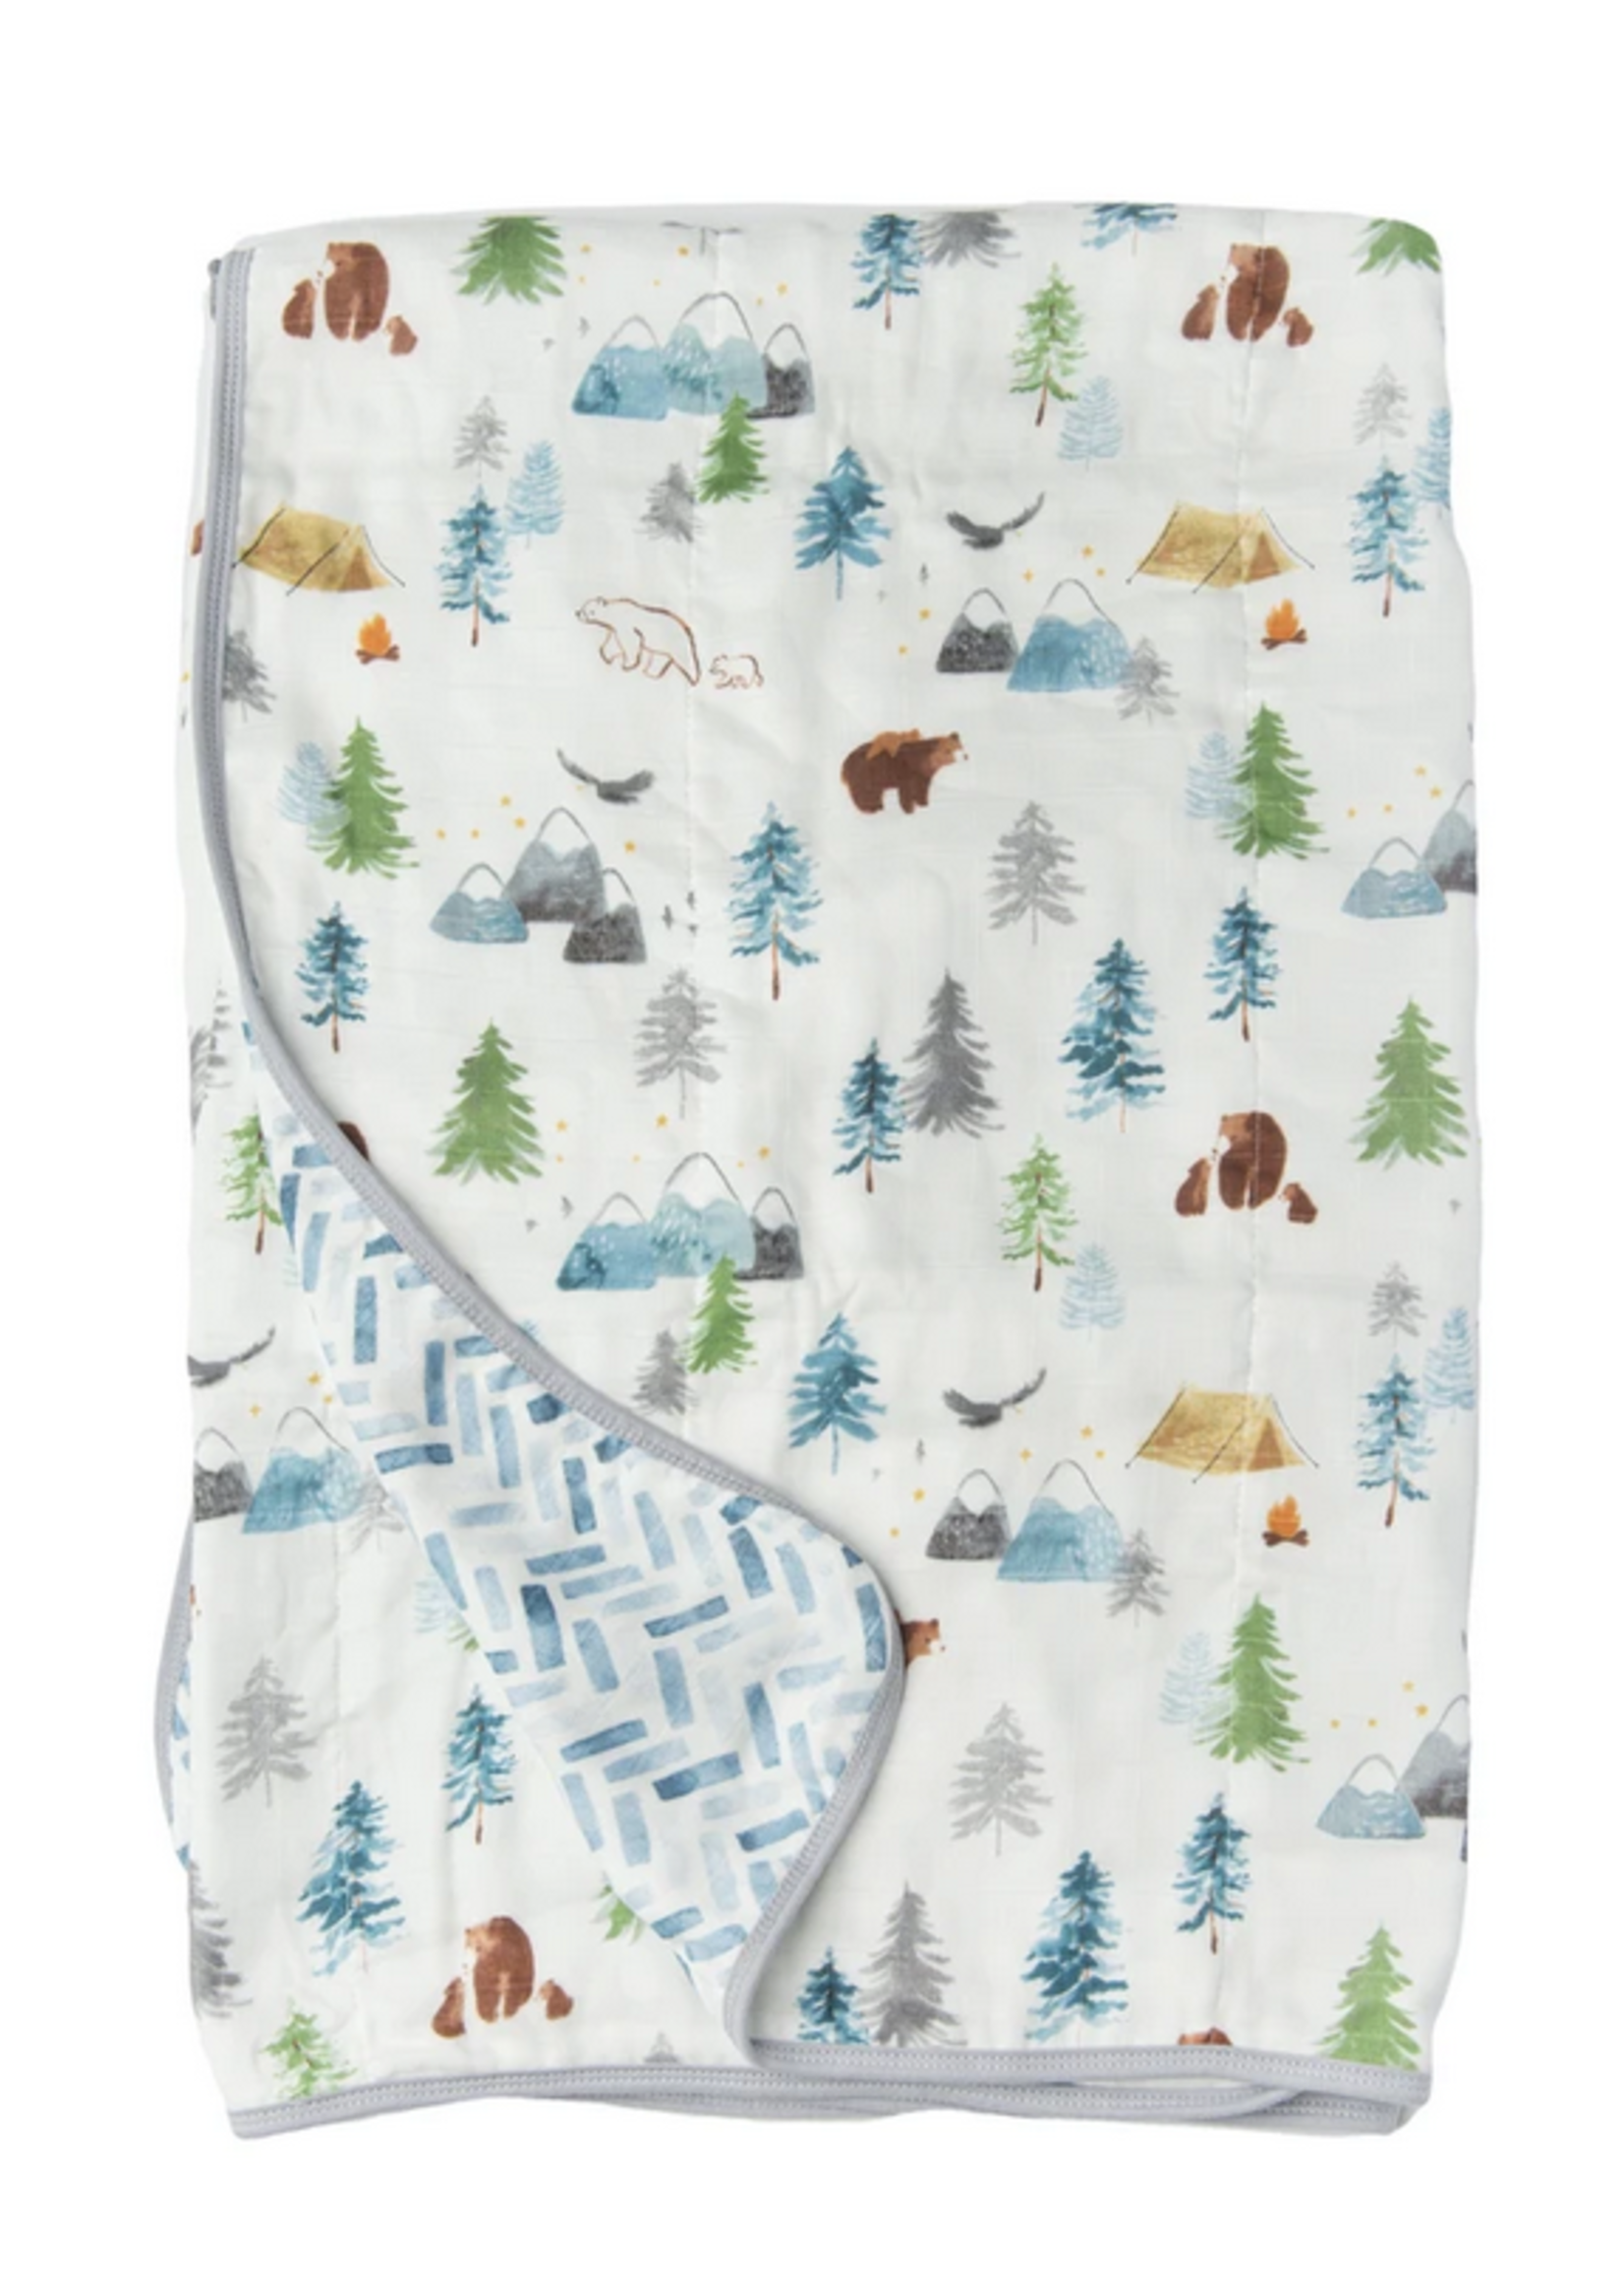 Elitaire Petite Muslin Quilt Blanket - Adventure Begins